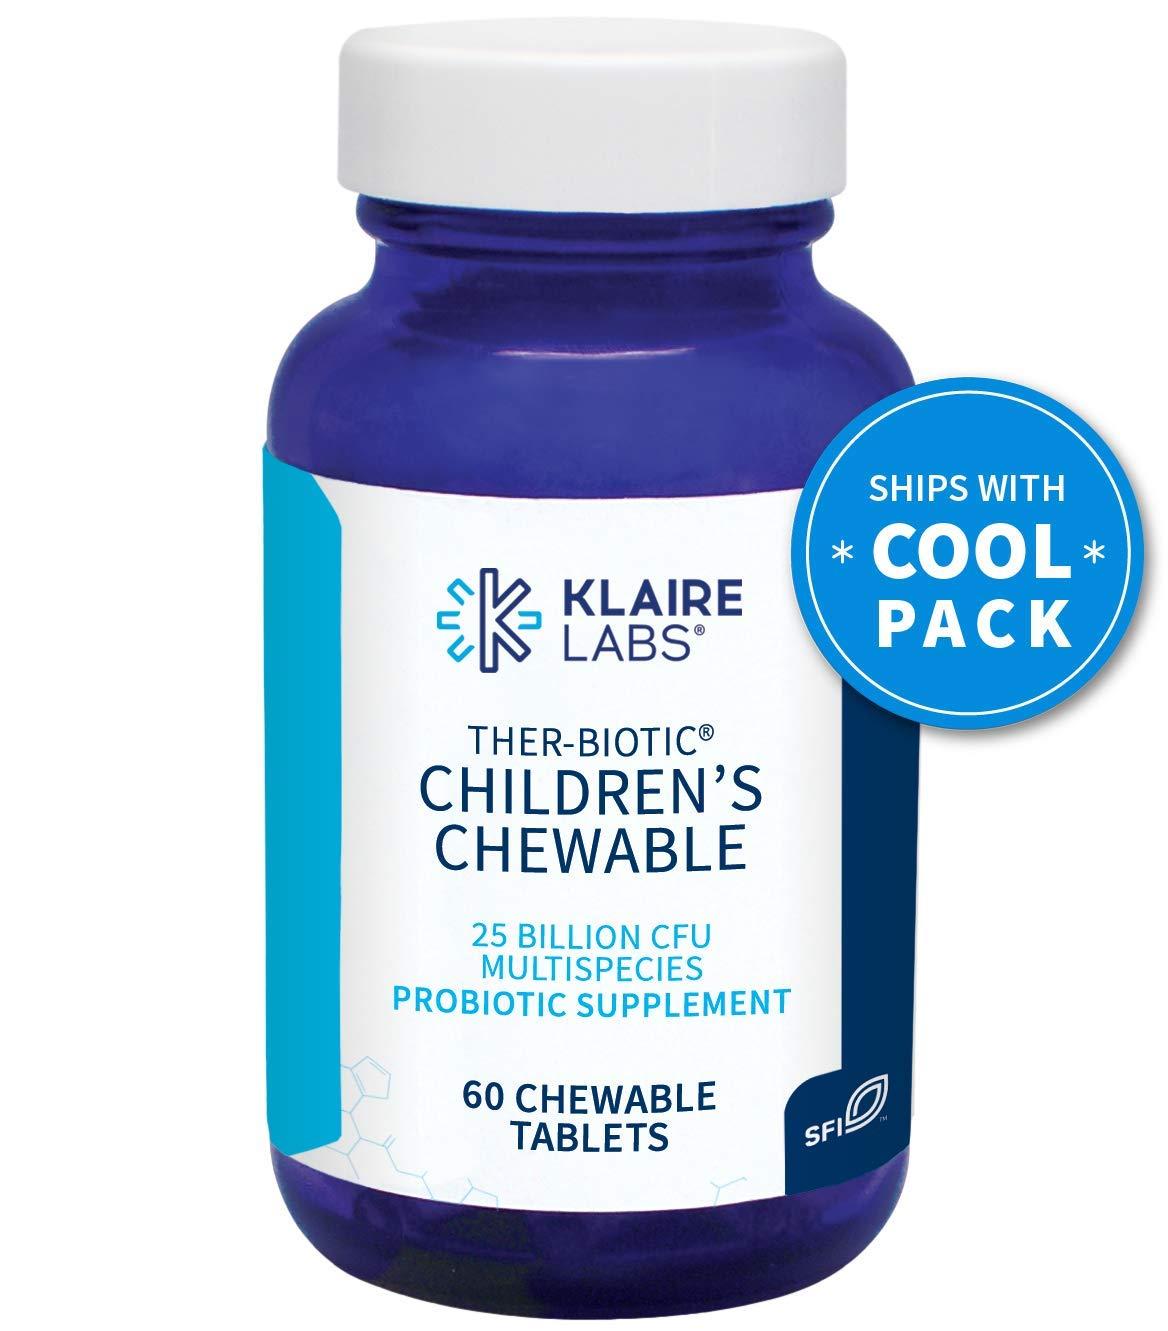 Klaire Labs Ther-Biotic Children's Chewable Probiotic - 25 Billion High CFU, The Original Hypoallergenic Probiotic for Kids with Lactobacillus & Bifidobacterium, Dairy-Free (60 Tablets)